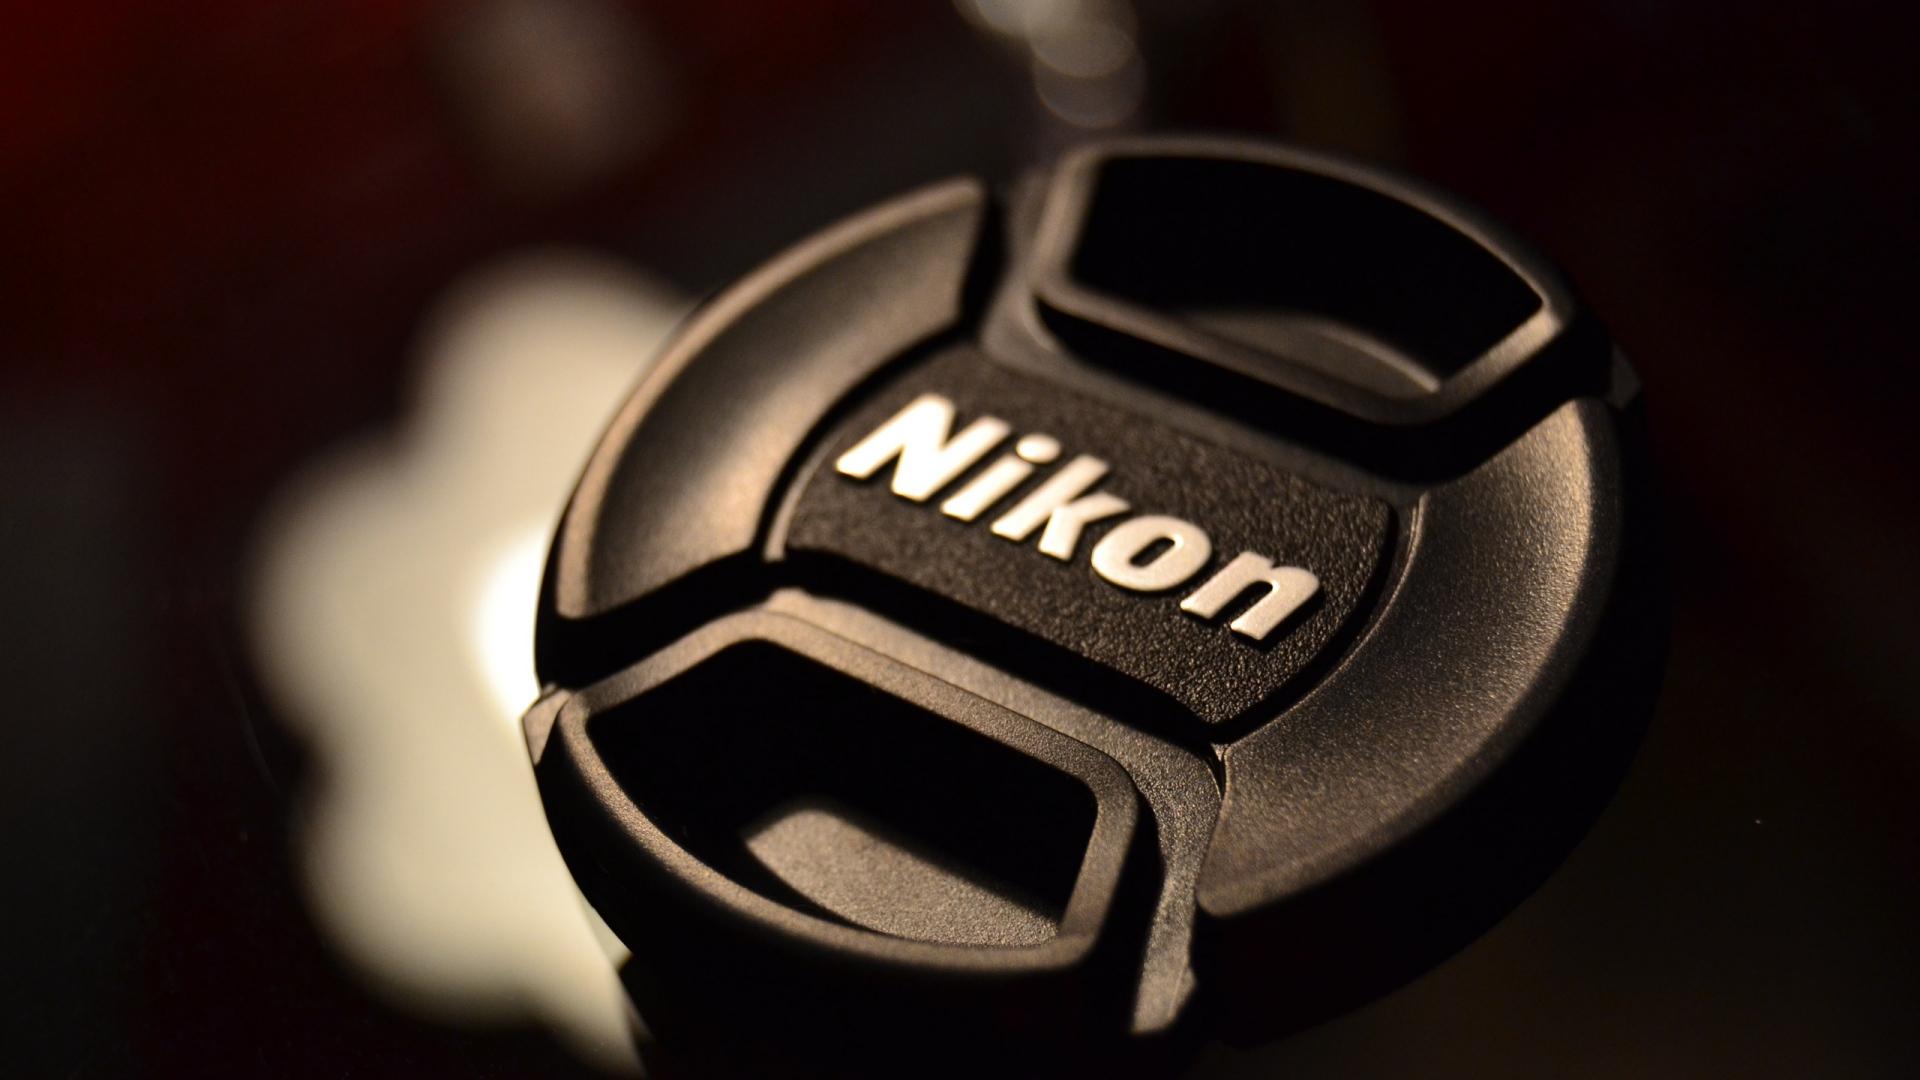 nikon-logo-camera